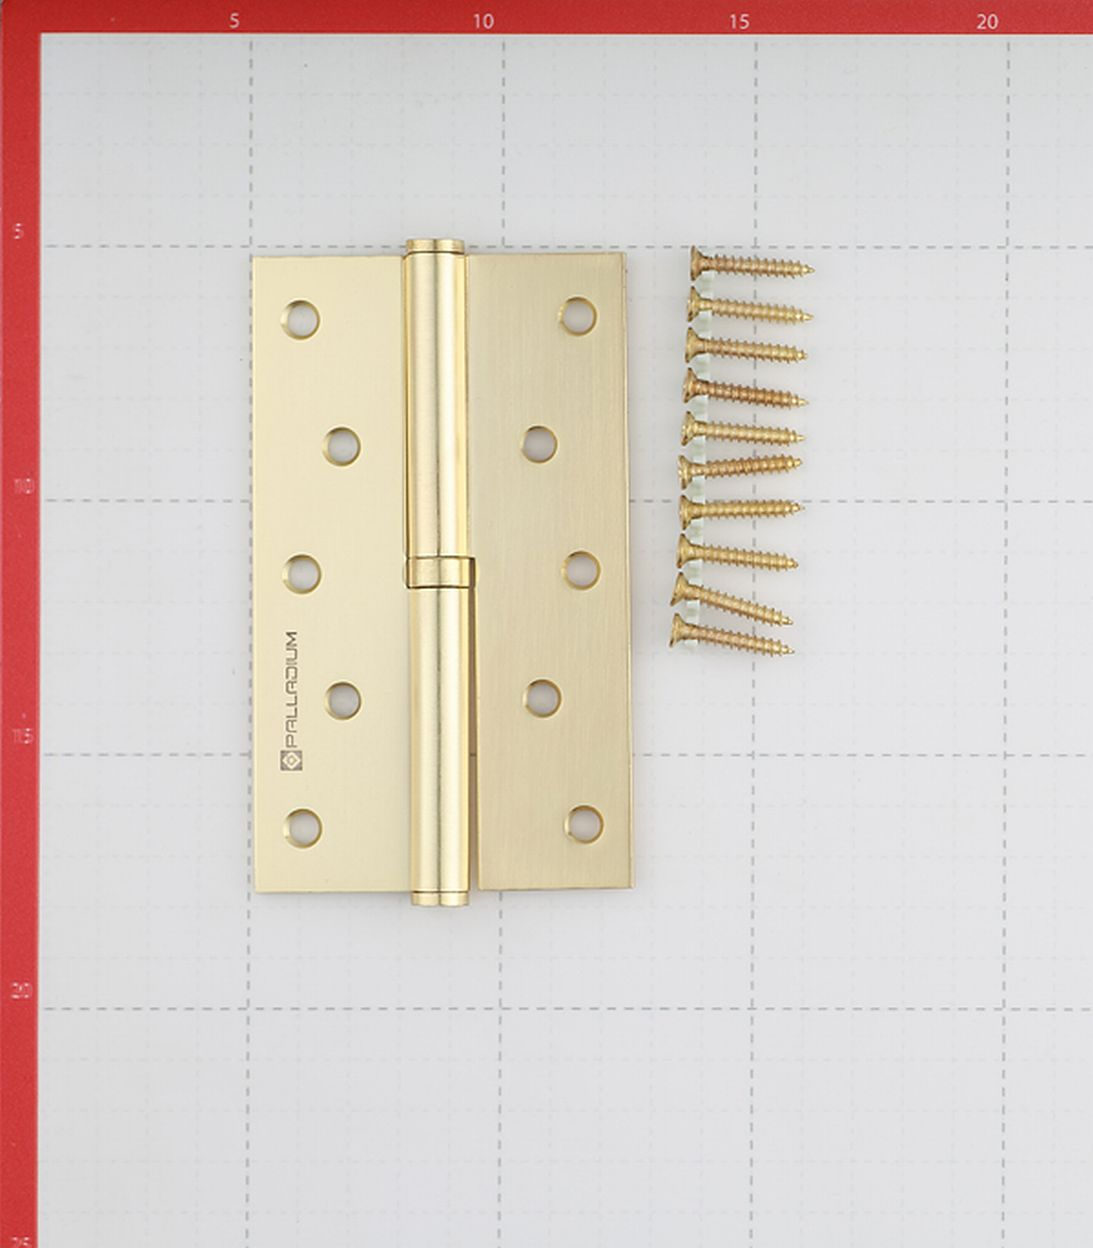 Петля Palladium N 613-S-5 SB правая разъемная 125х75 мм латунь